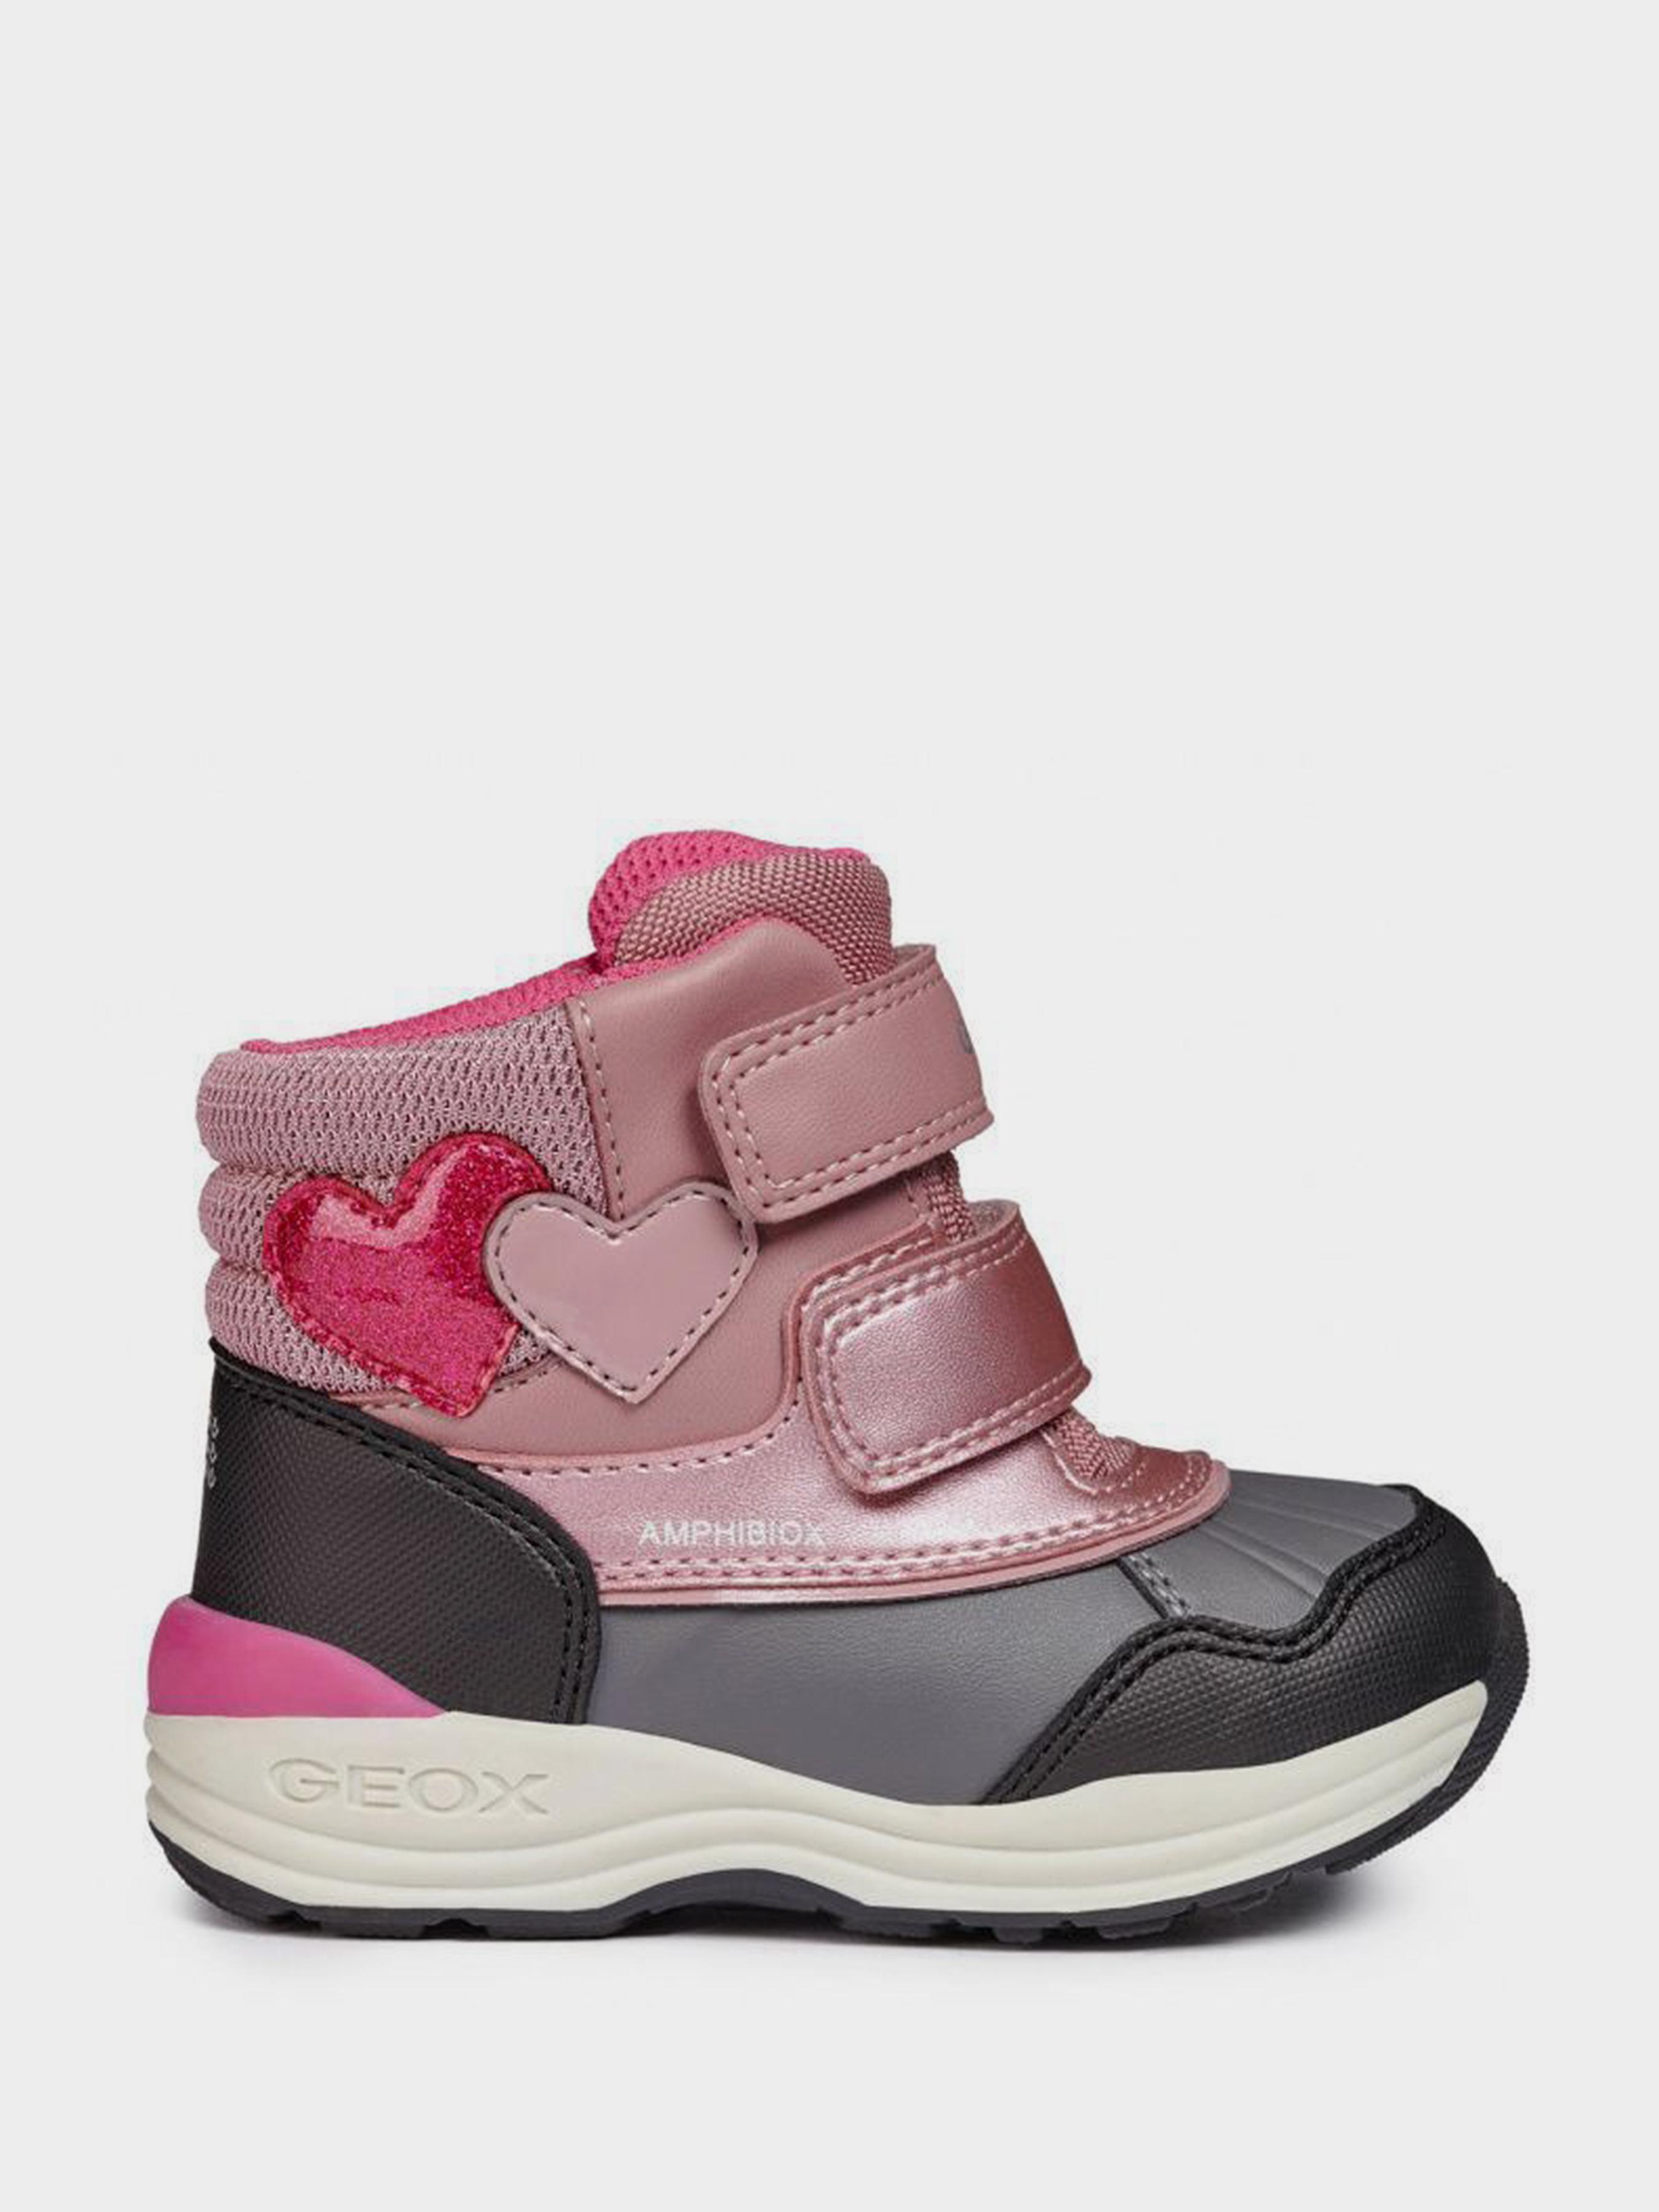 Купить Ботинки детские Geox B NEW GULP GIRL B AB XK5859, Розовый